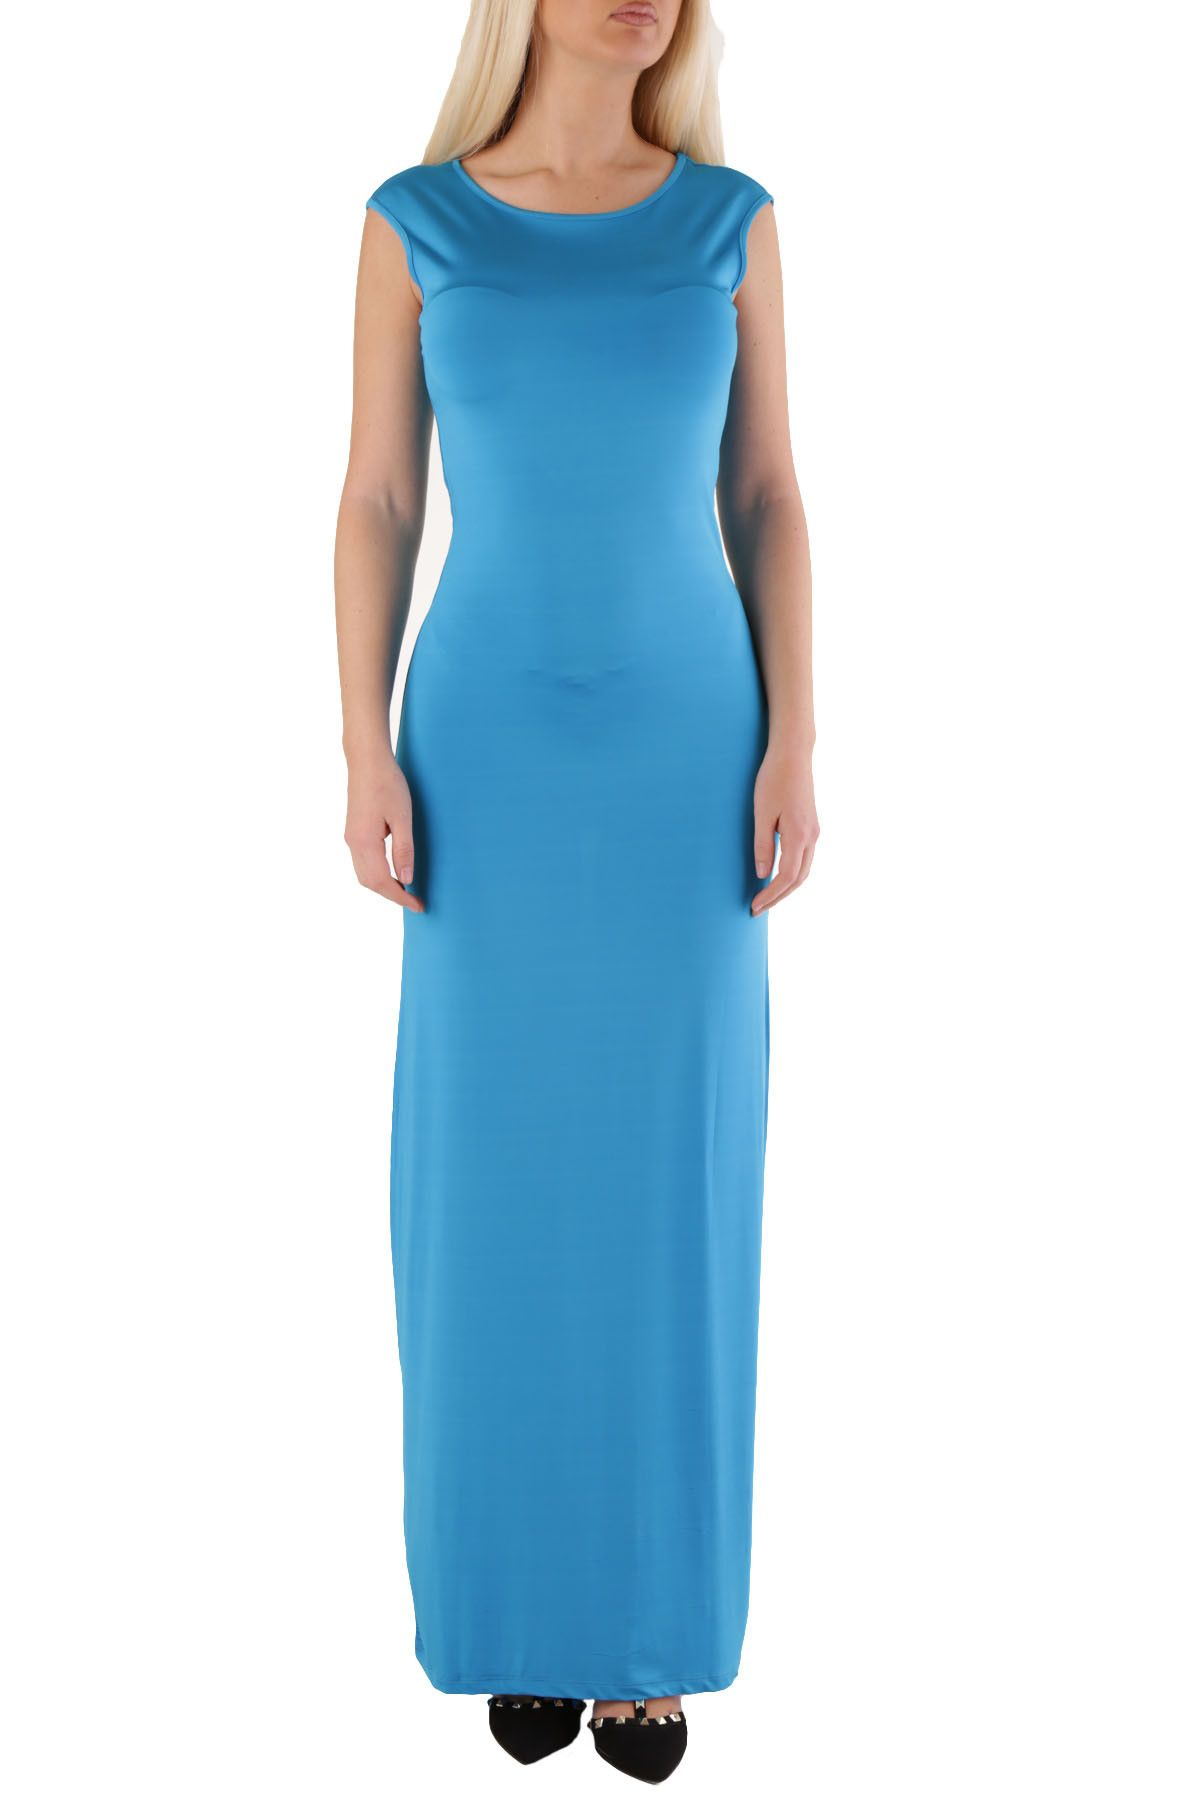 Met Women's Dress In Blue